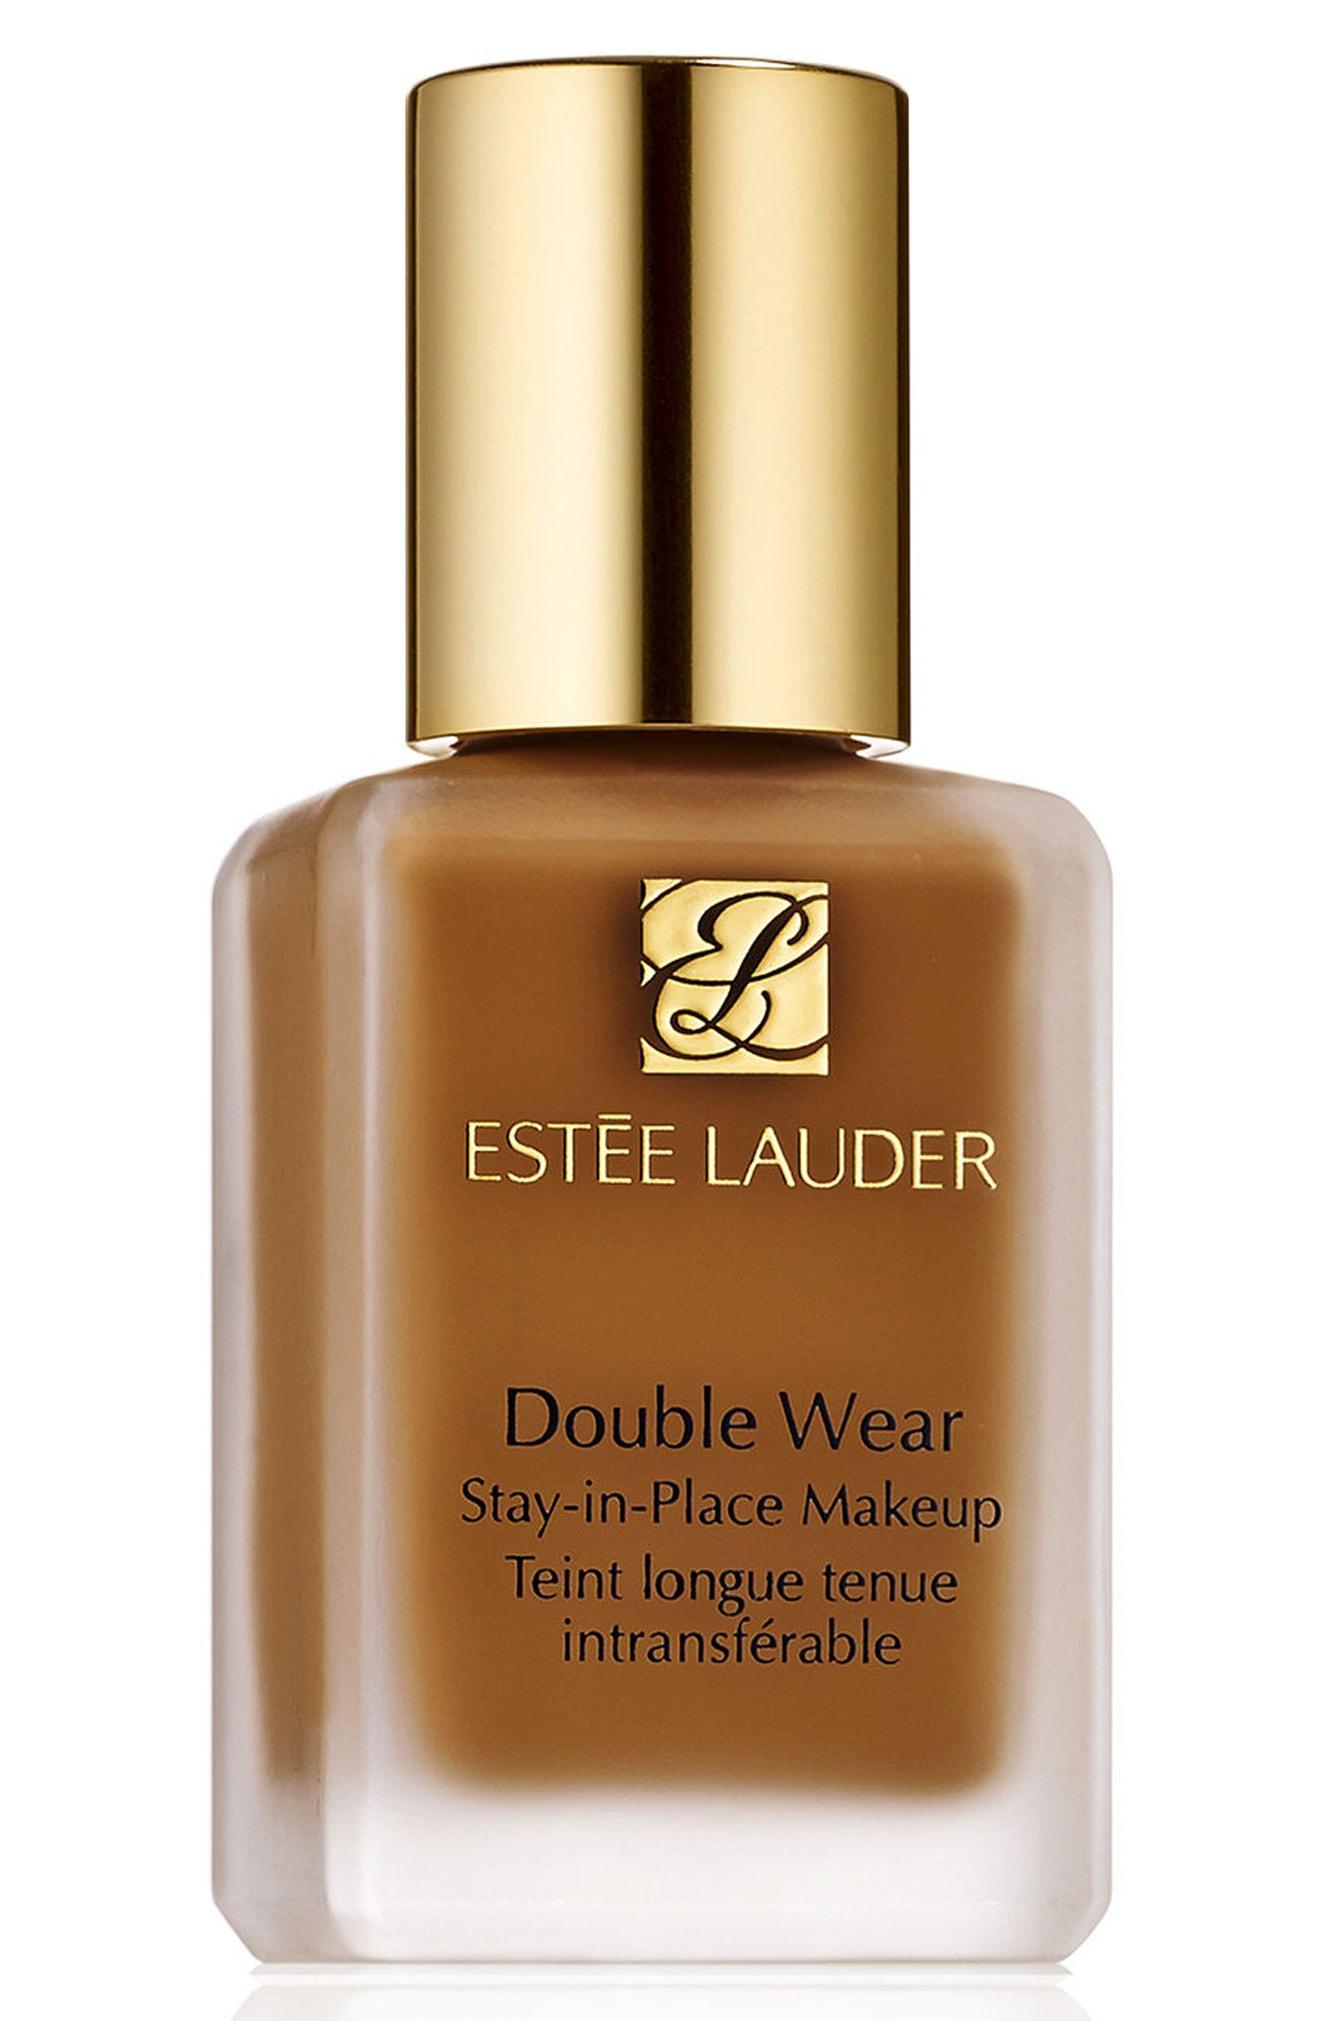 Estee Lauder Double Wear Foundation Nordstrom